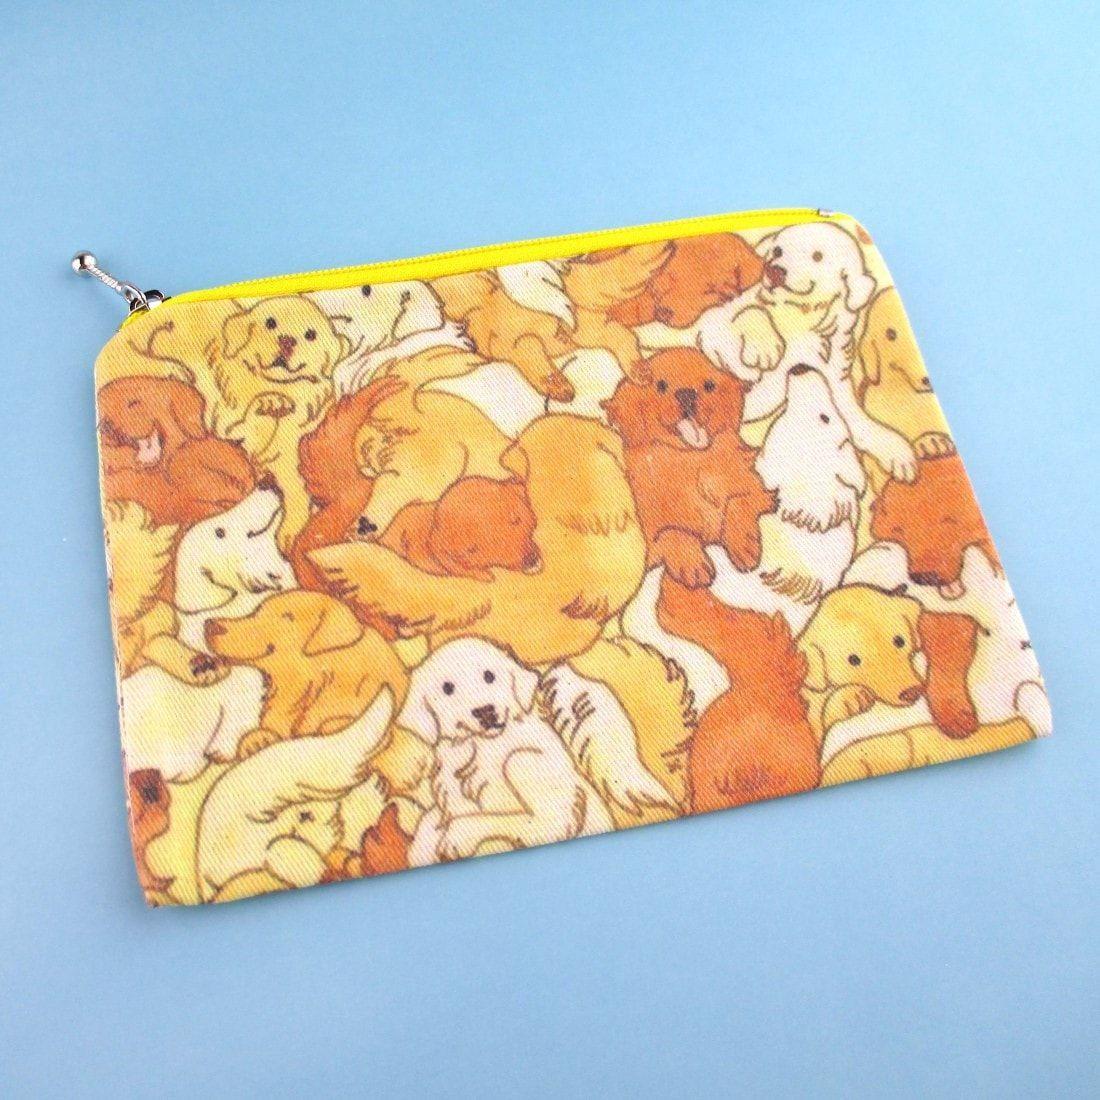 Illustrated Golden Retriever Puppy Dog Collage Print Rectangular Make Up Bag